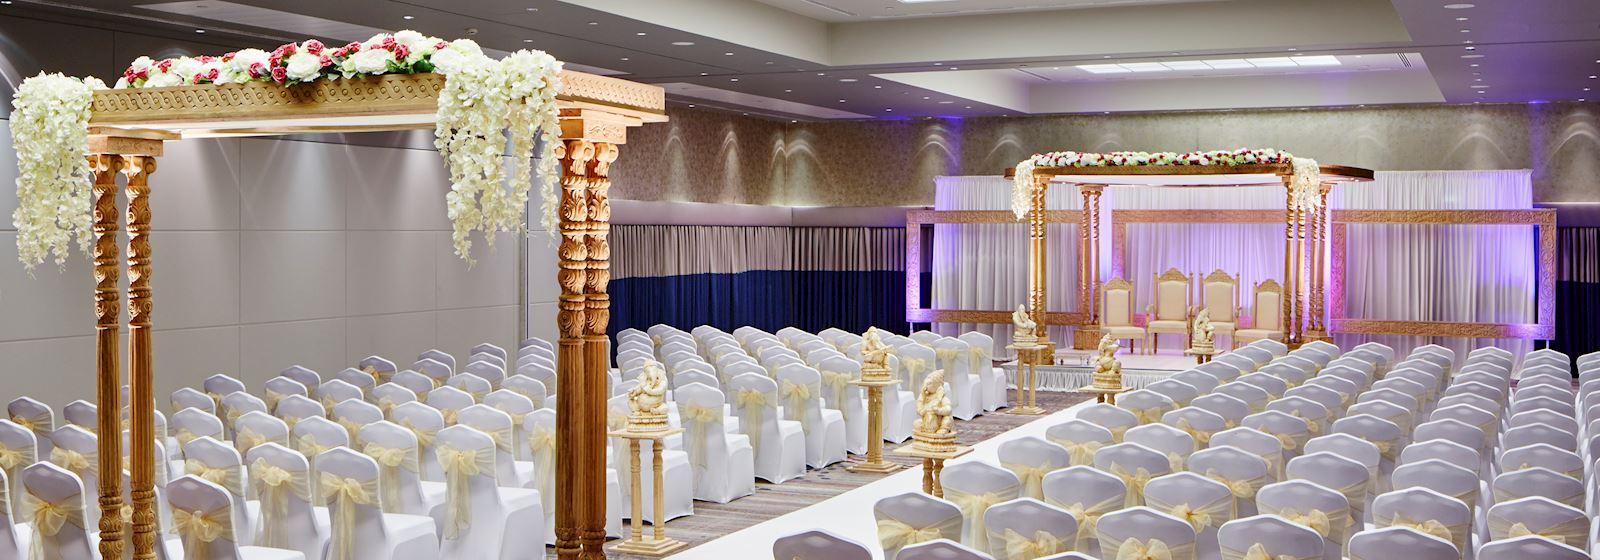 Leicester Marriott Hotel Weddings